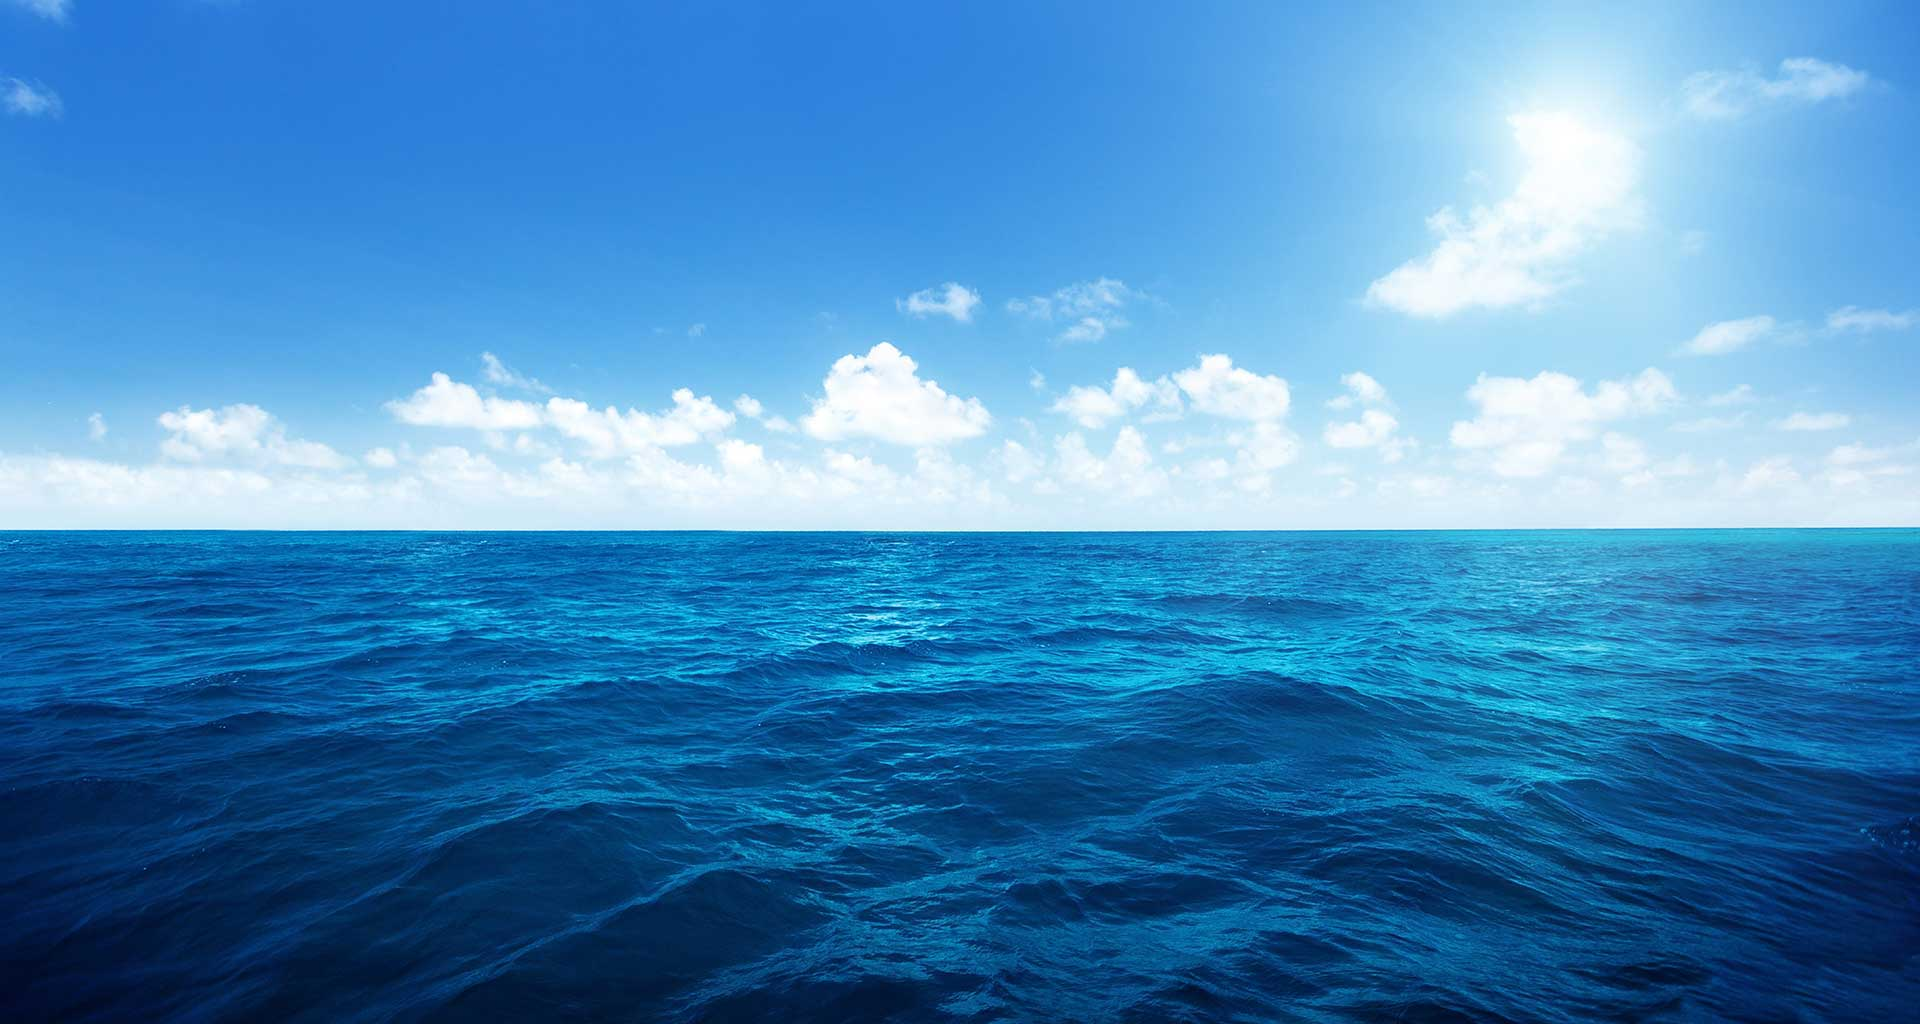 море и небо5.jpg